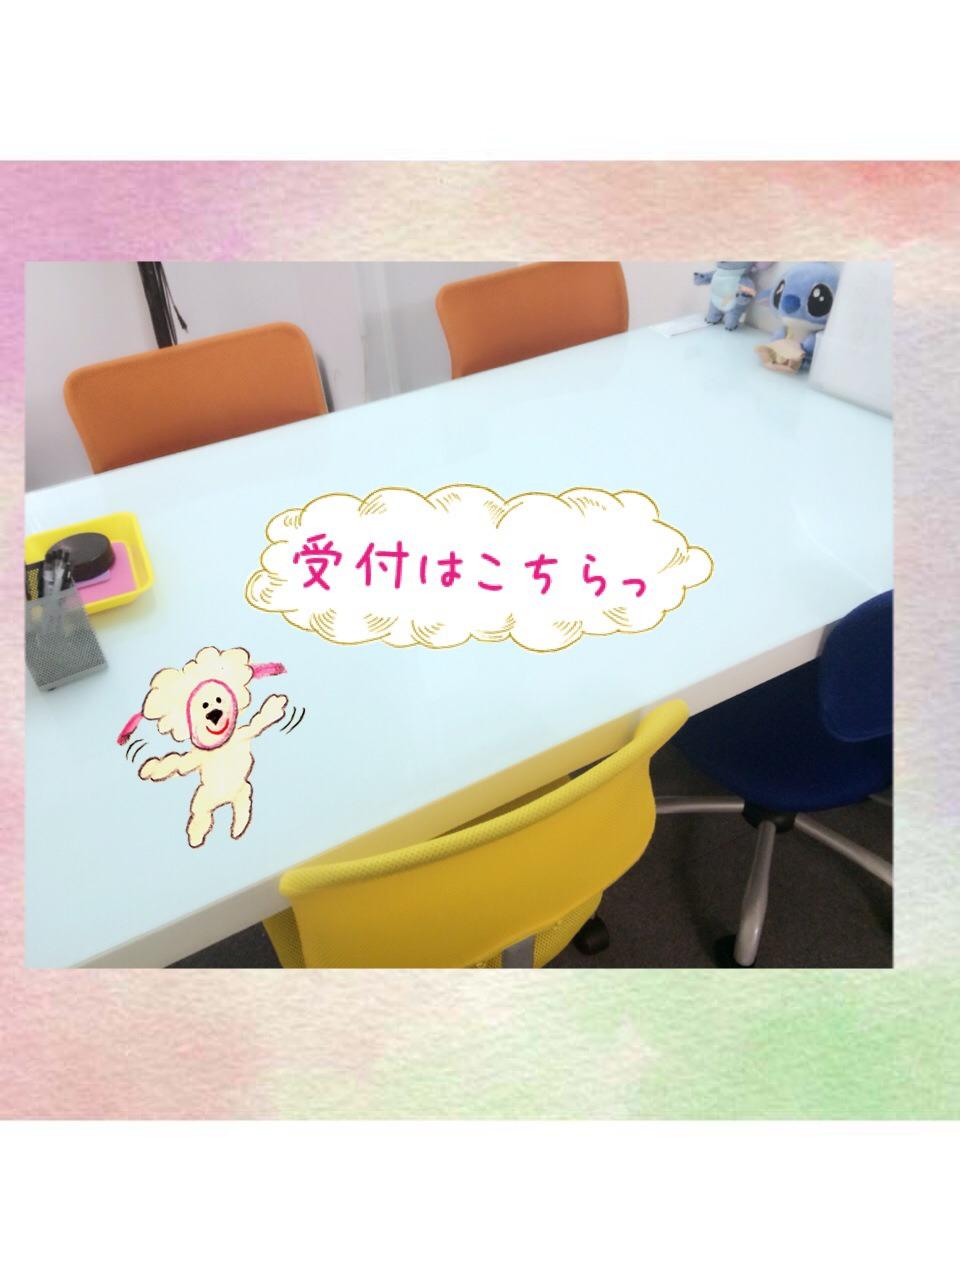 S__11272196.jpg